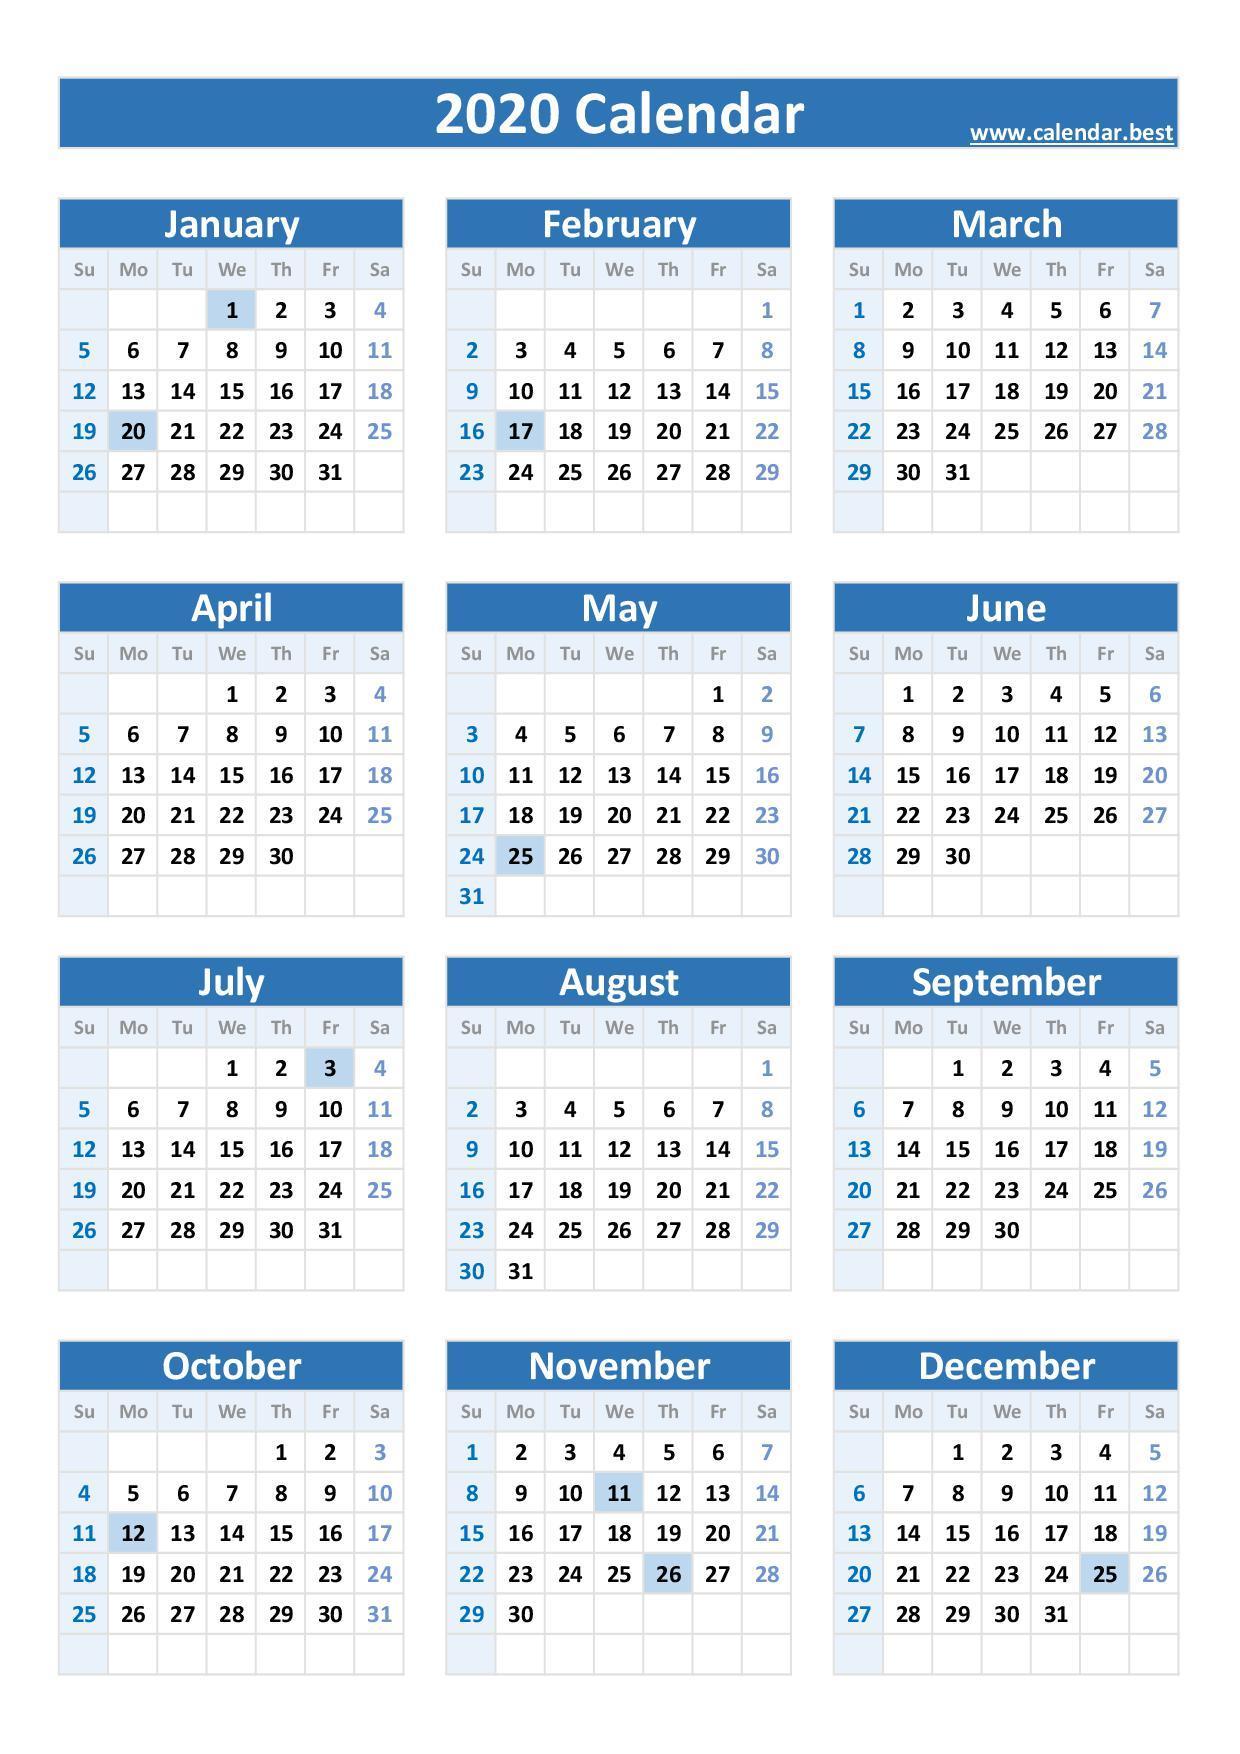 Calendrier Federale 2 2021 2022 2020, 2021, 2022 Federal Holidays : list and calendars  Calendars.best